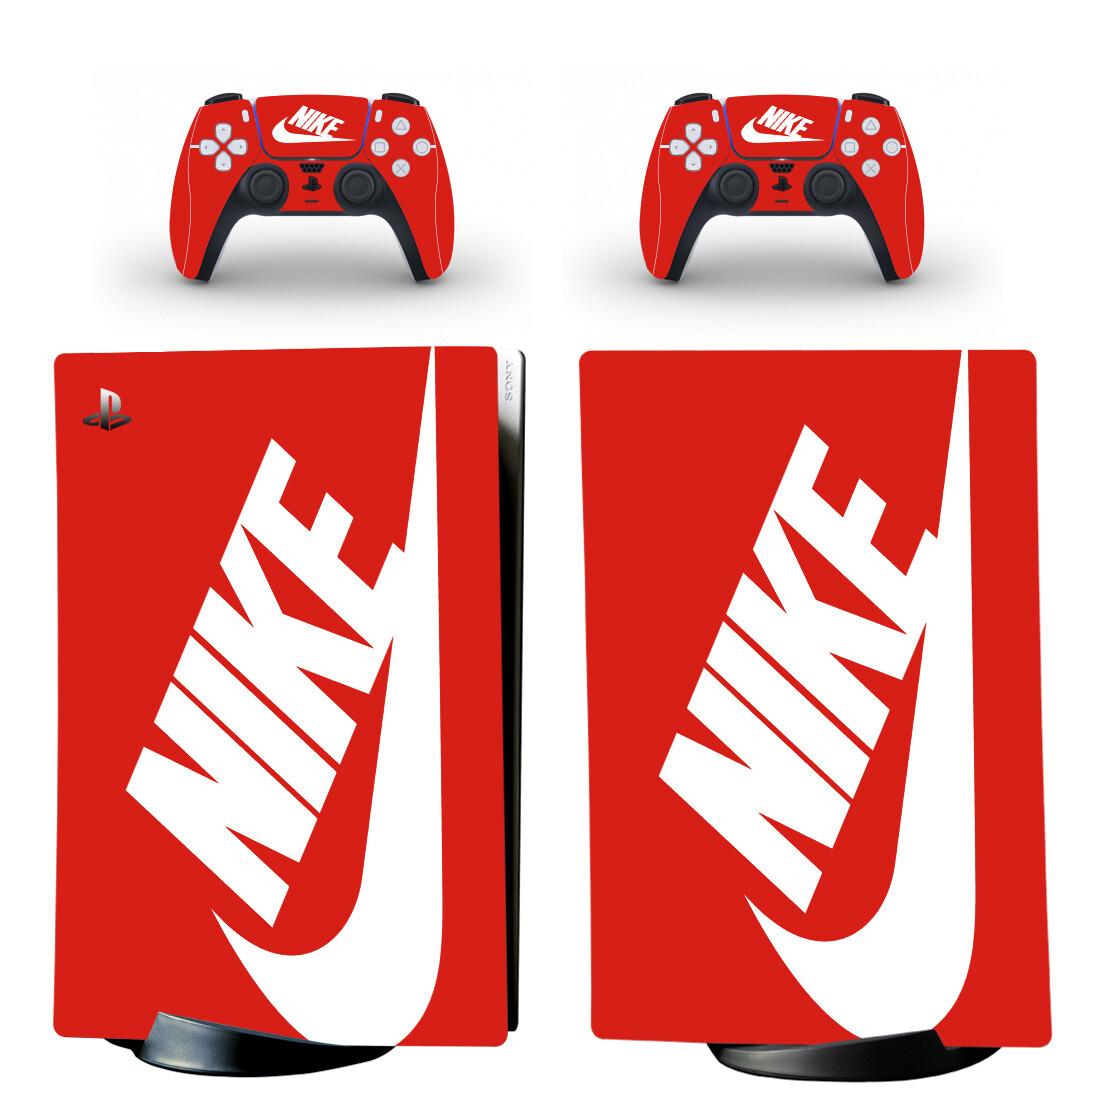 Nike PS5 Digital Edition Skin Sticker Decal Design 2